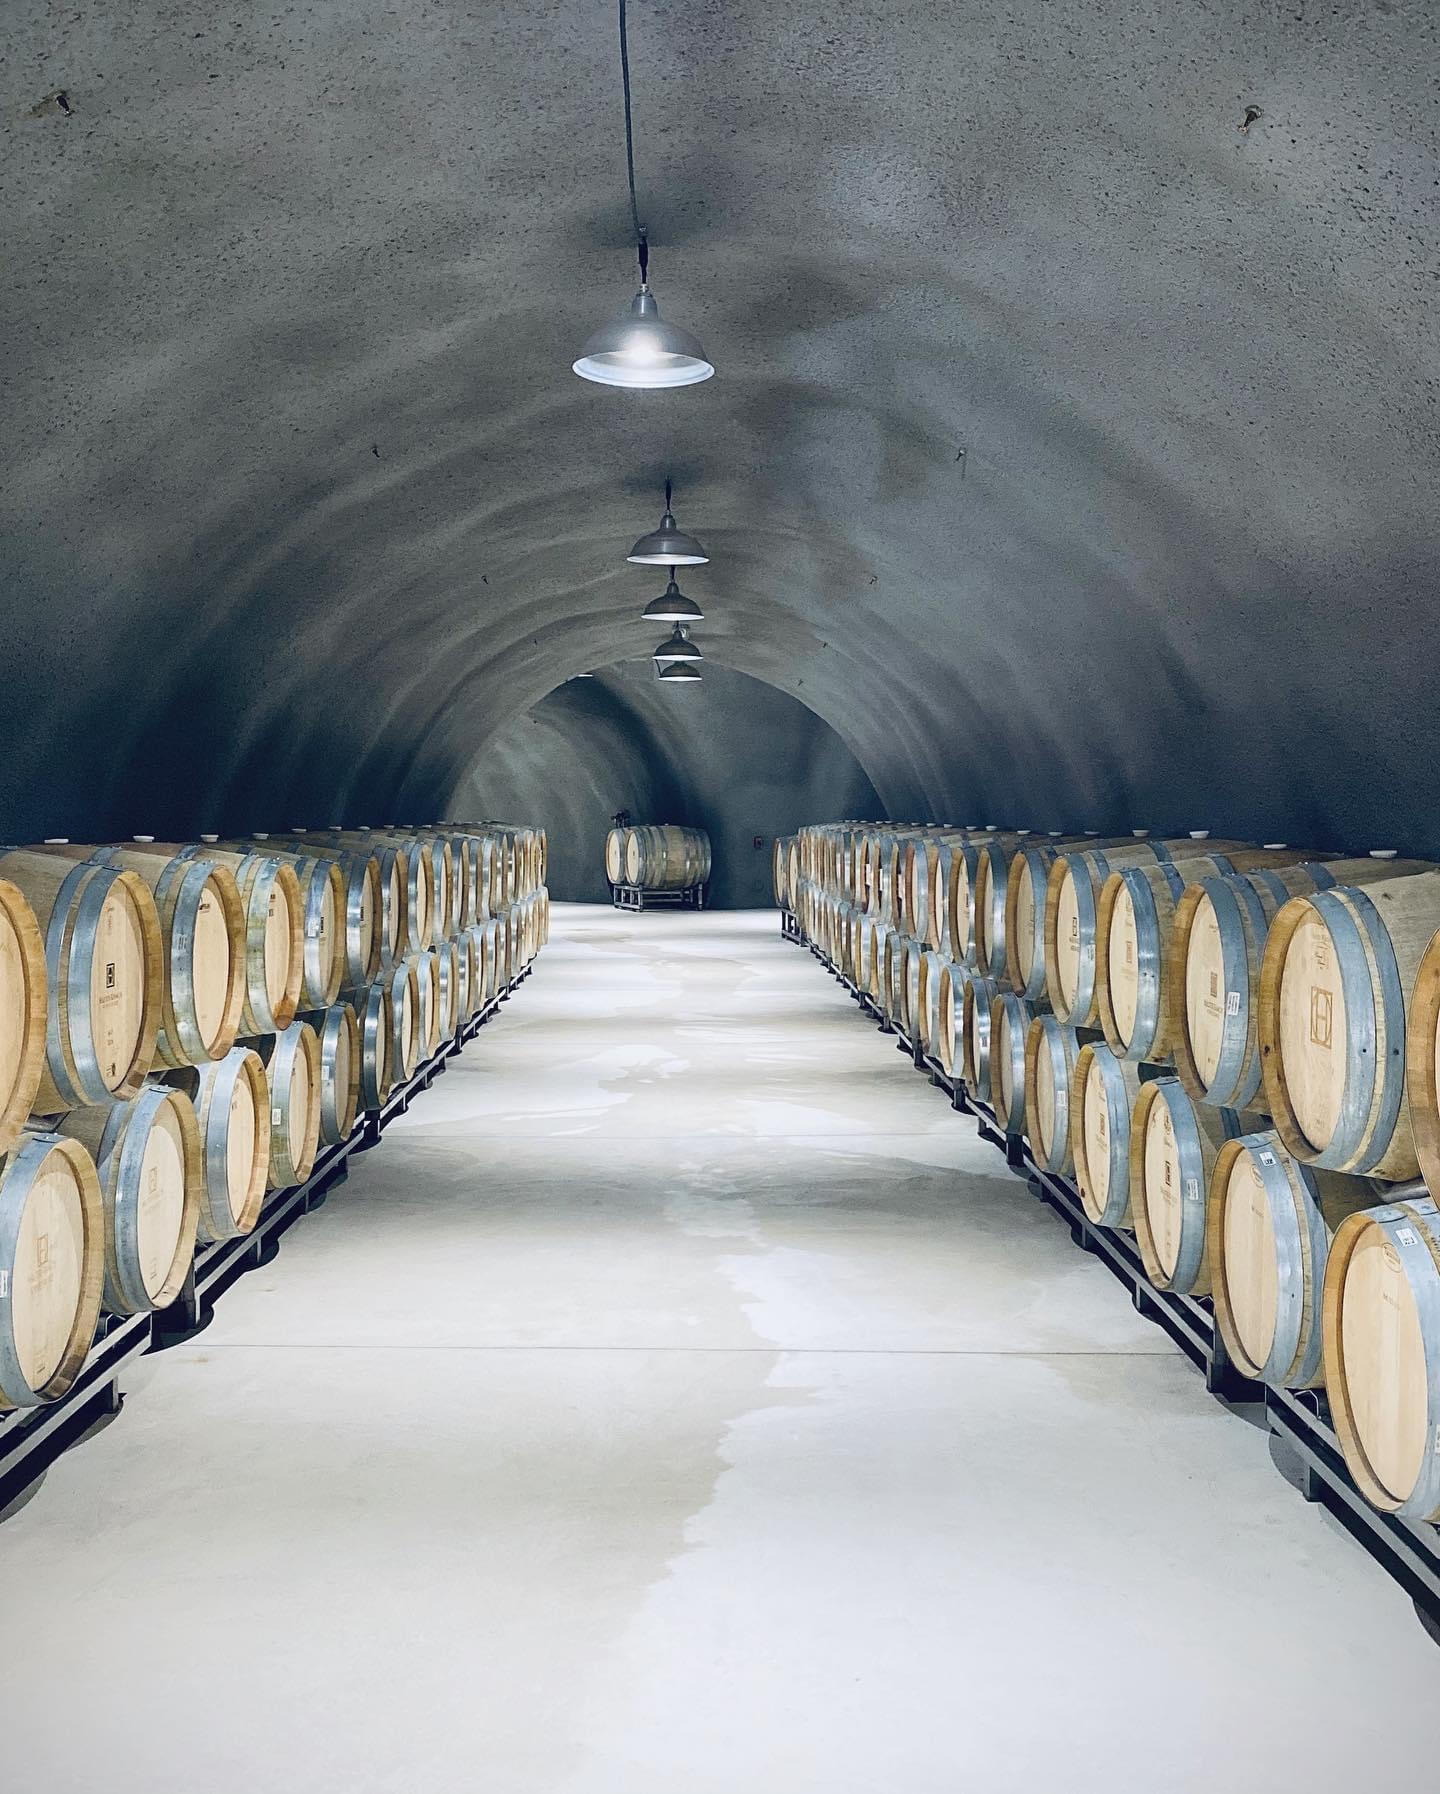 Estate Wine Tours Next Adventure 805 Santa Barbara-29